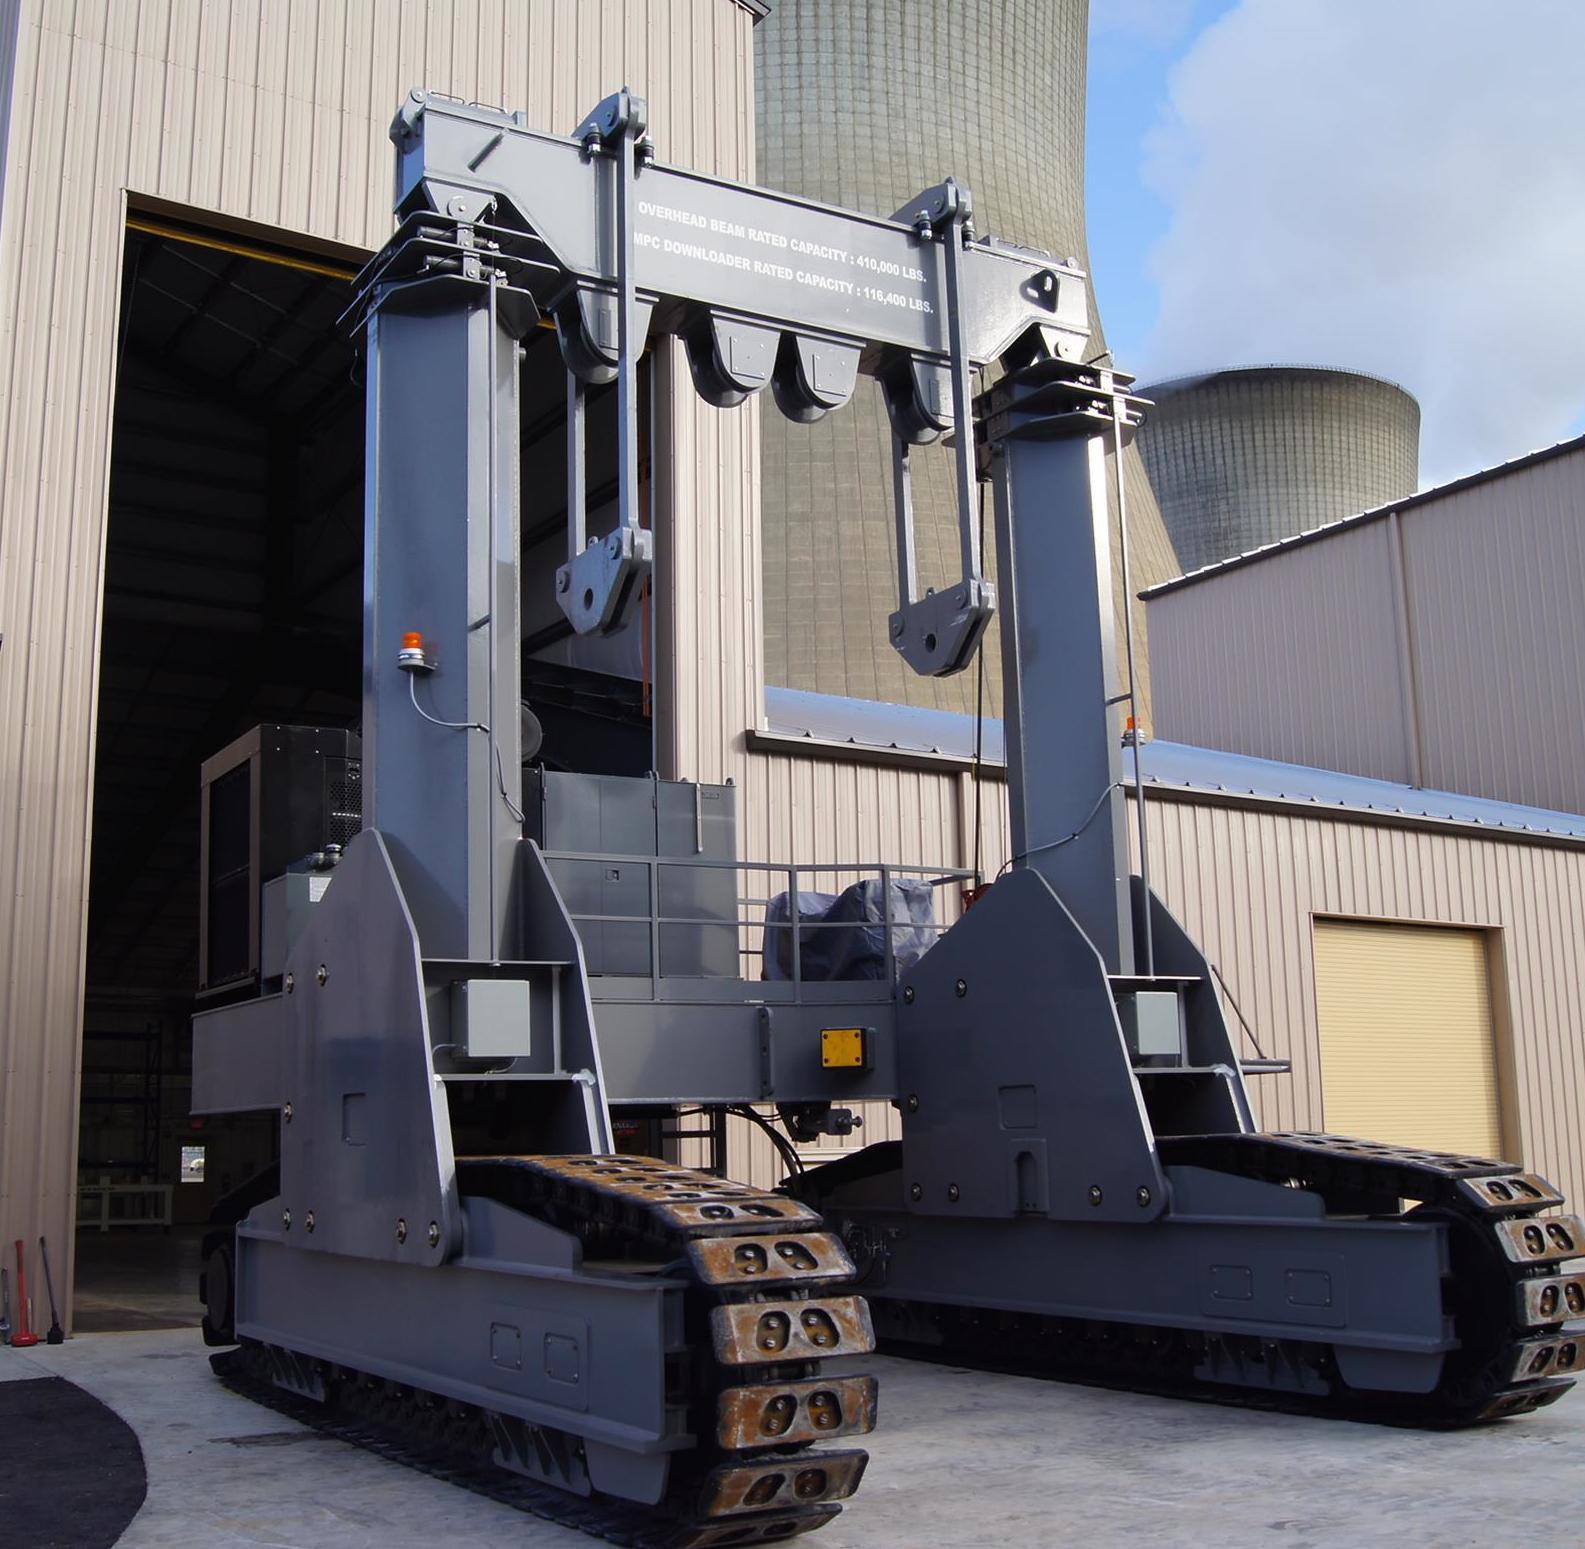 The Vertical Cask Transporter Design Evolution Reaches the Plateau of Maturity & Versatility